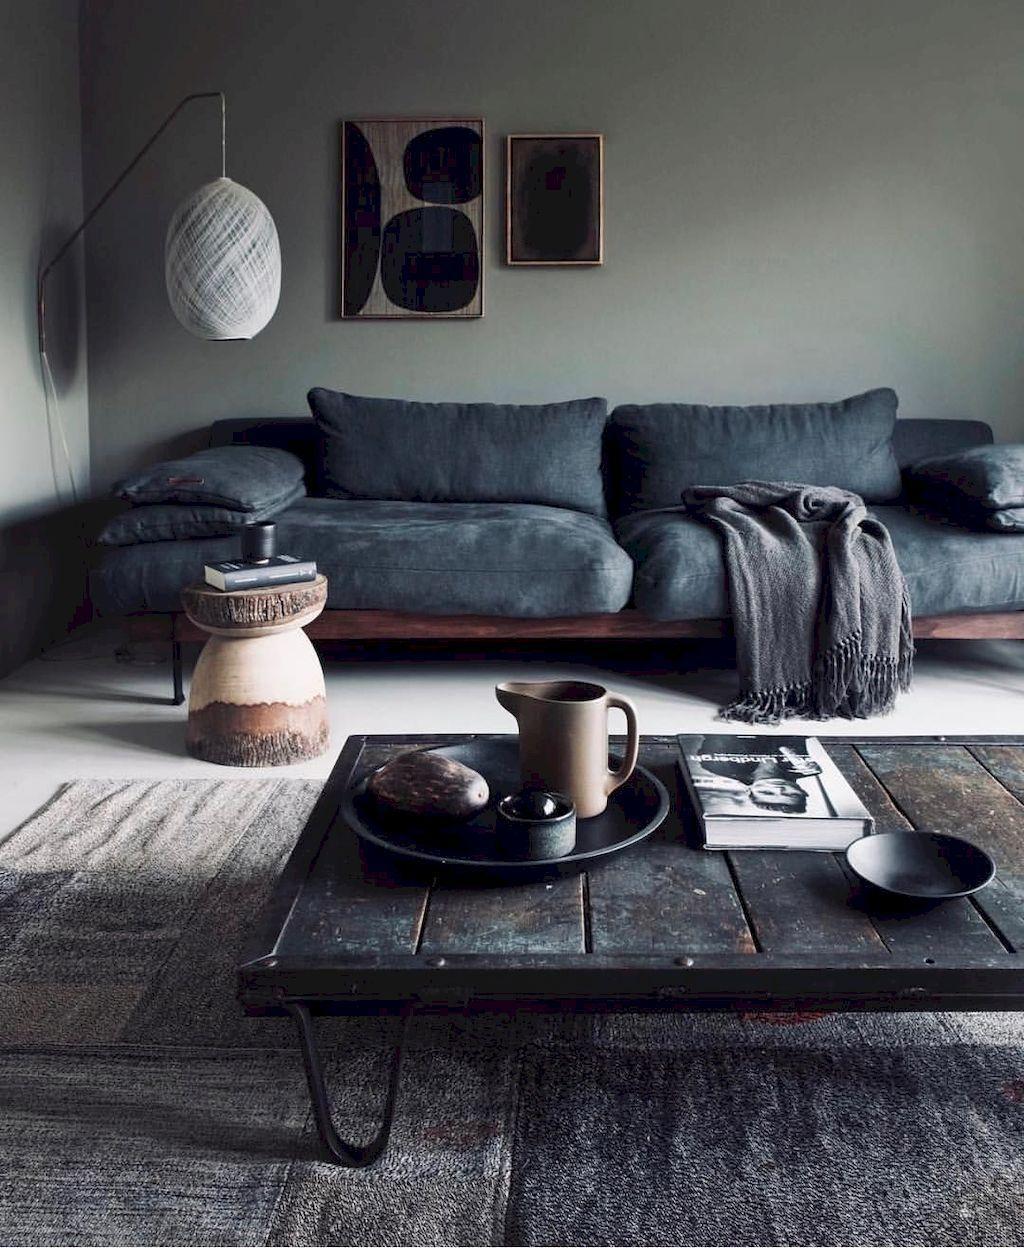 Excellent Furniture Design Ideas For Your Living Room 12